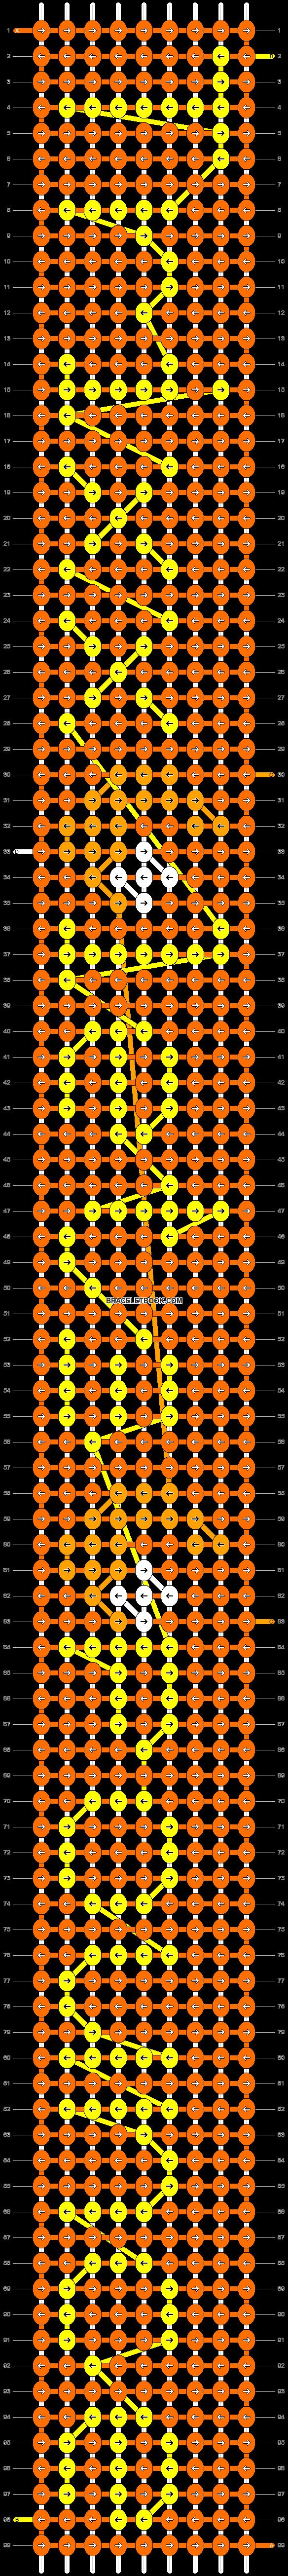 Alpha pattern #90524 pattern